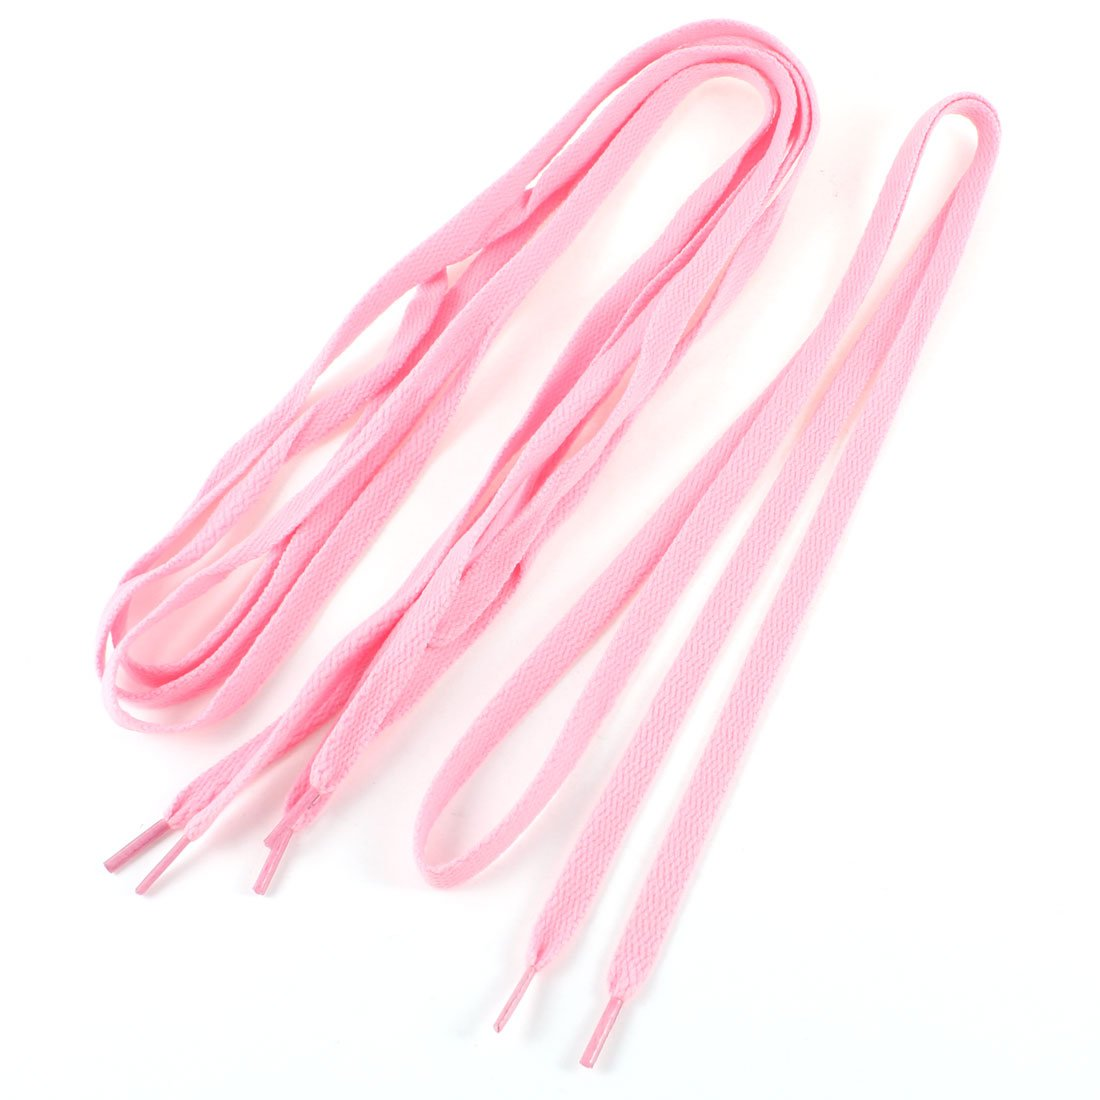 37e3a4fec50 2 Pairs StyleWoman Pink Flat Shoelaces Trainer Sport Boot Shoe Laces ...